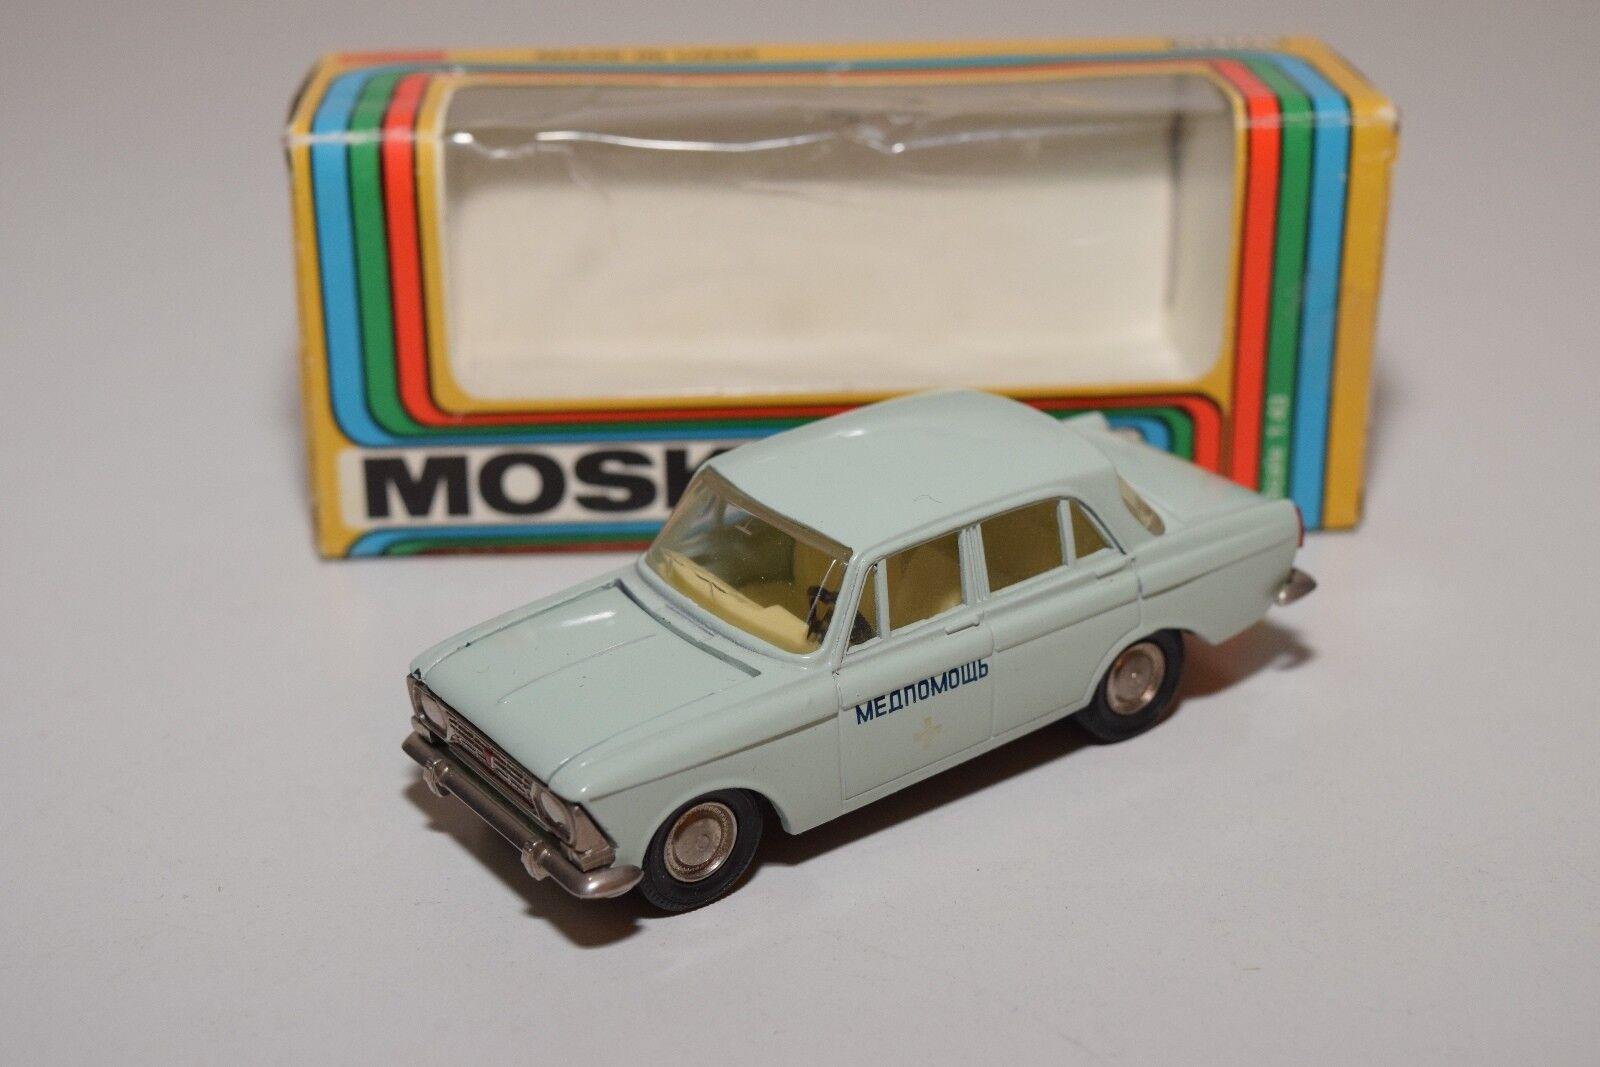 B RUSSIAN CAR USSR CCCP NOVOEXPORT A2 MOSKVITCH 412 412 412 AMBULANCE VN MINT BOXED 3e3e4a